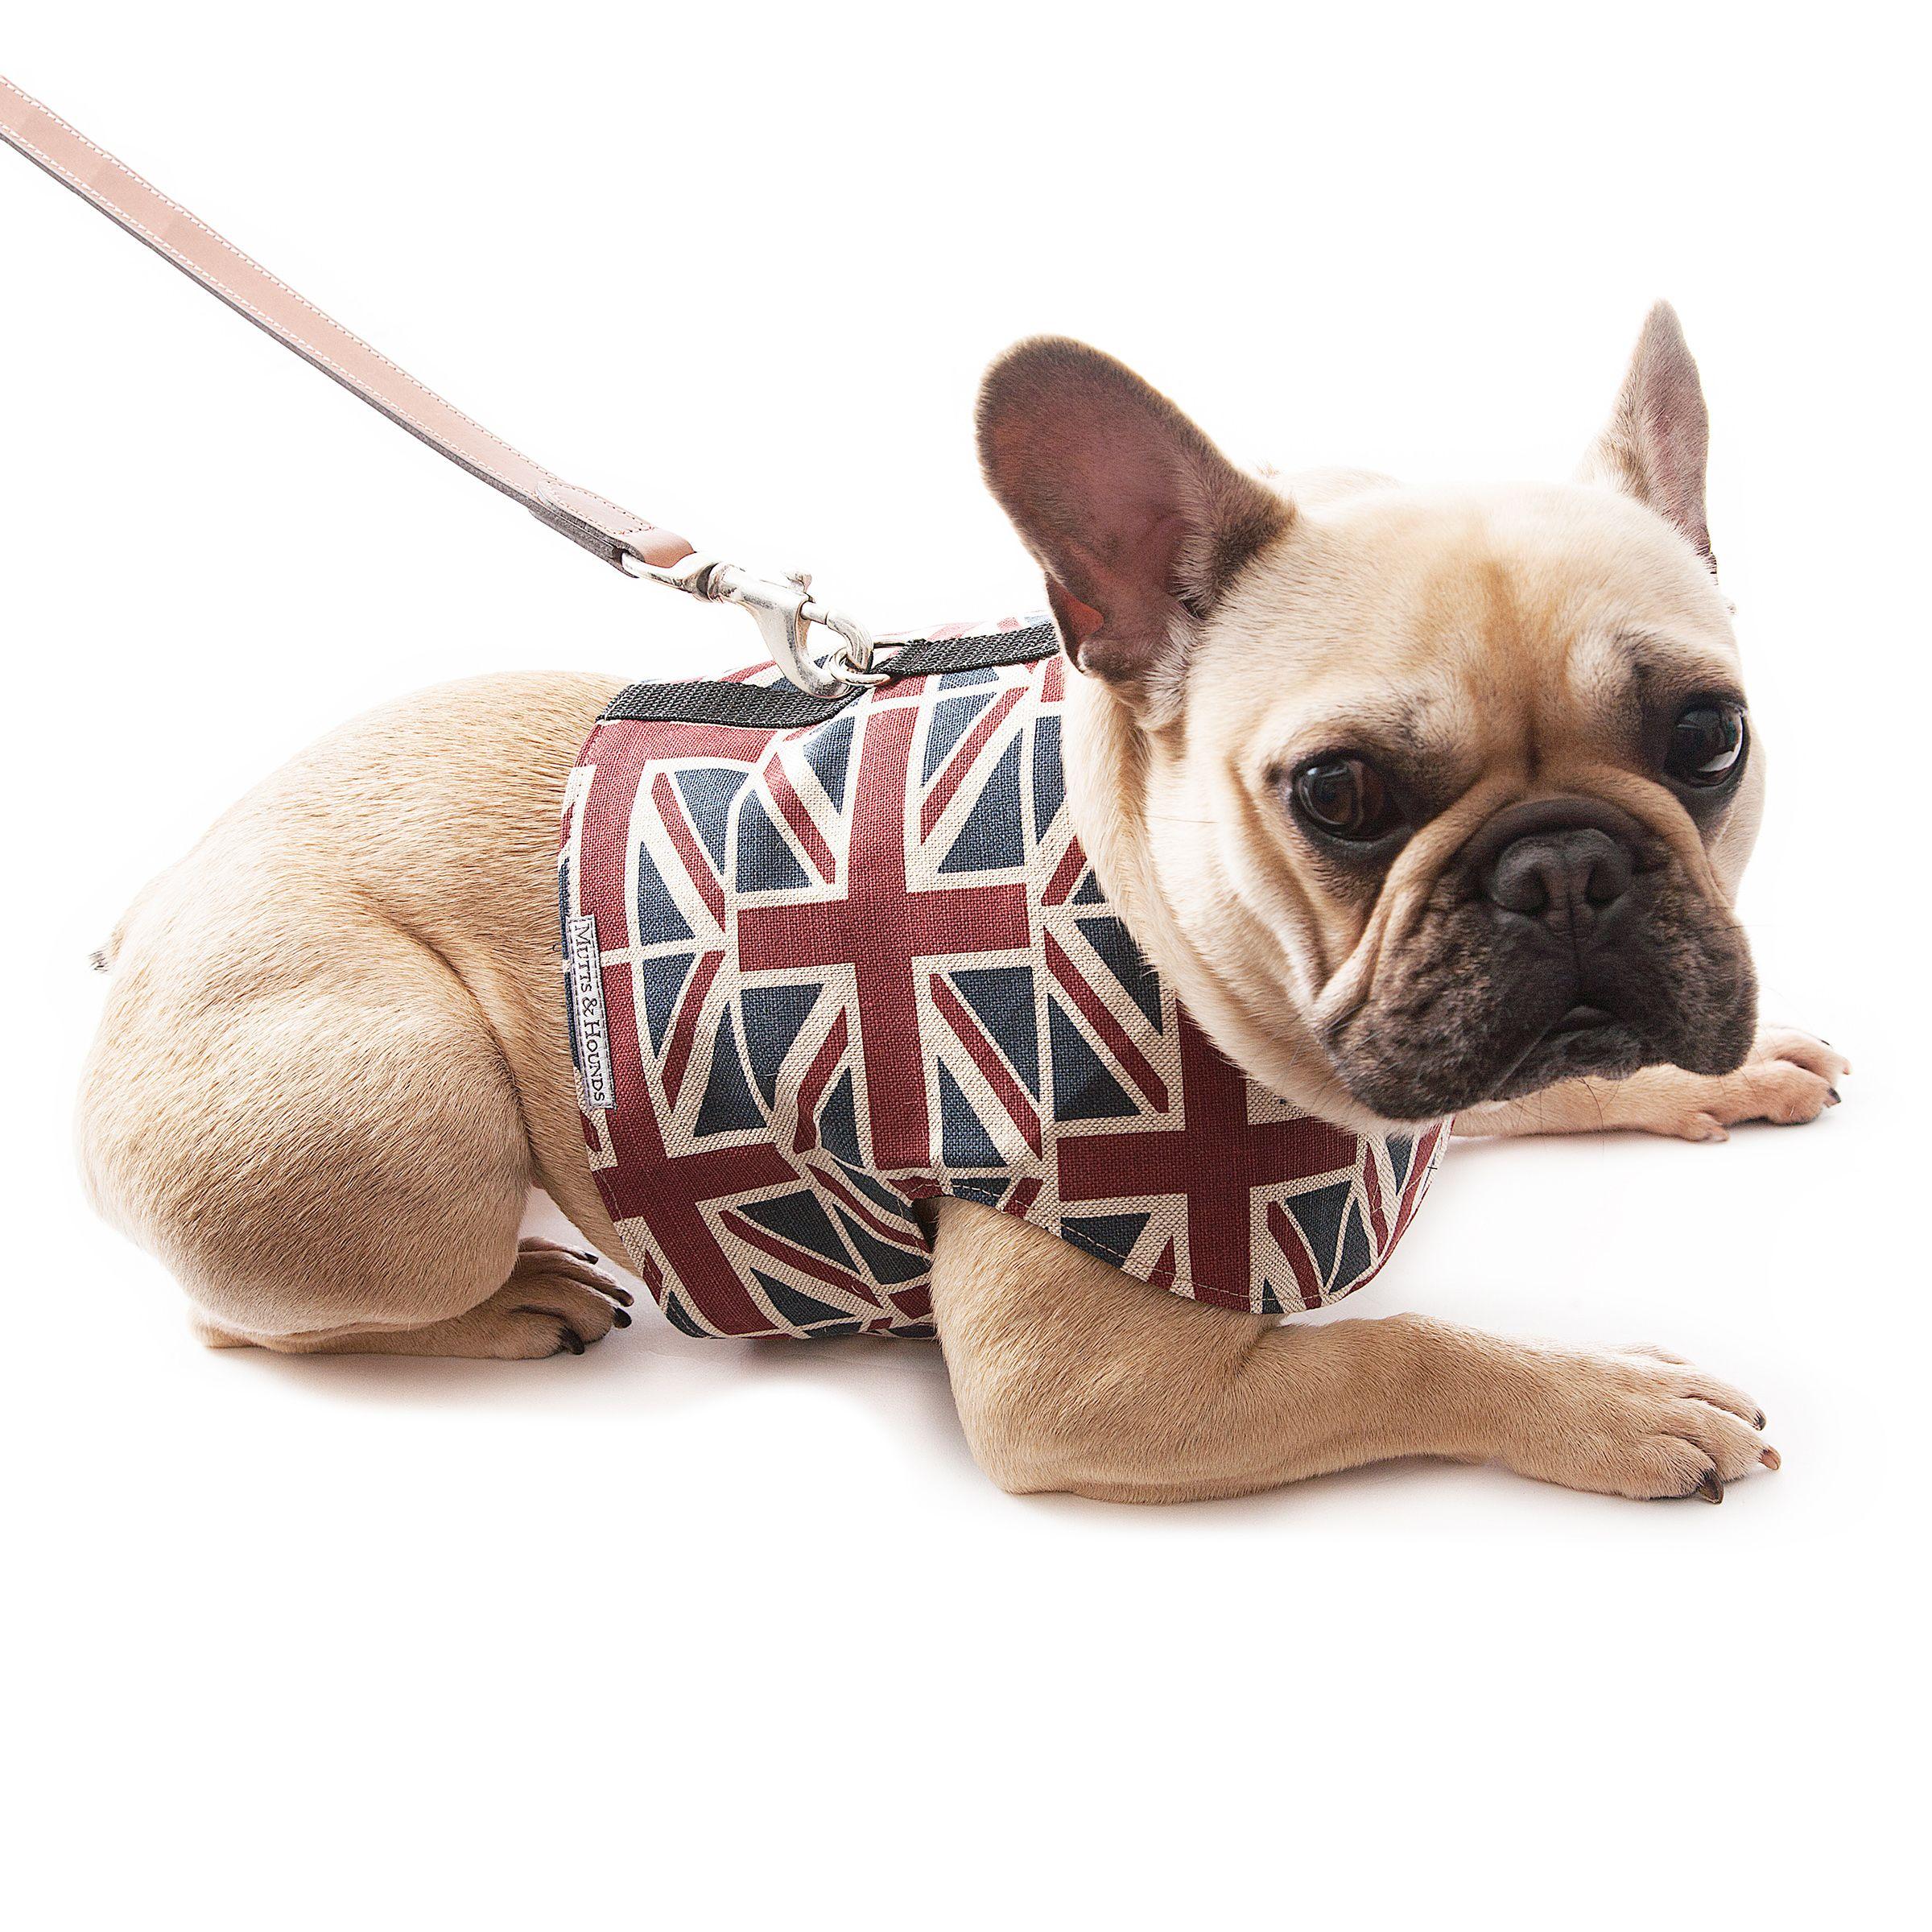 Union Jack Dog Harness Dog Harness French Bulldog Harness Dog